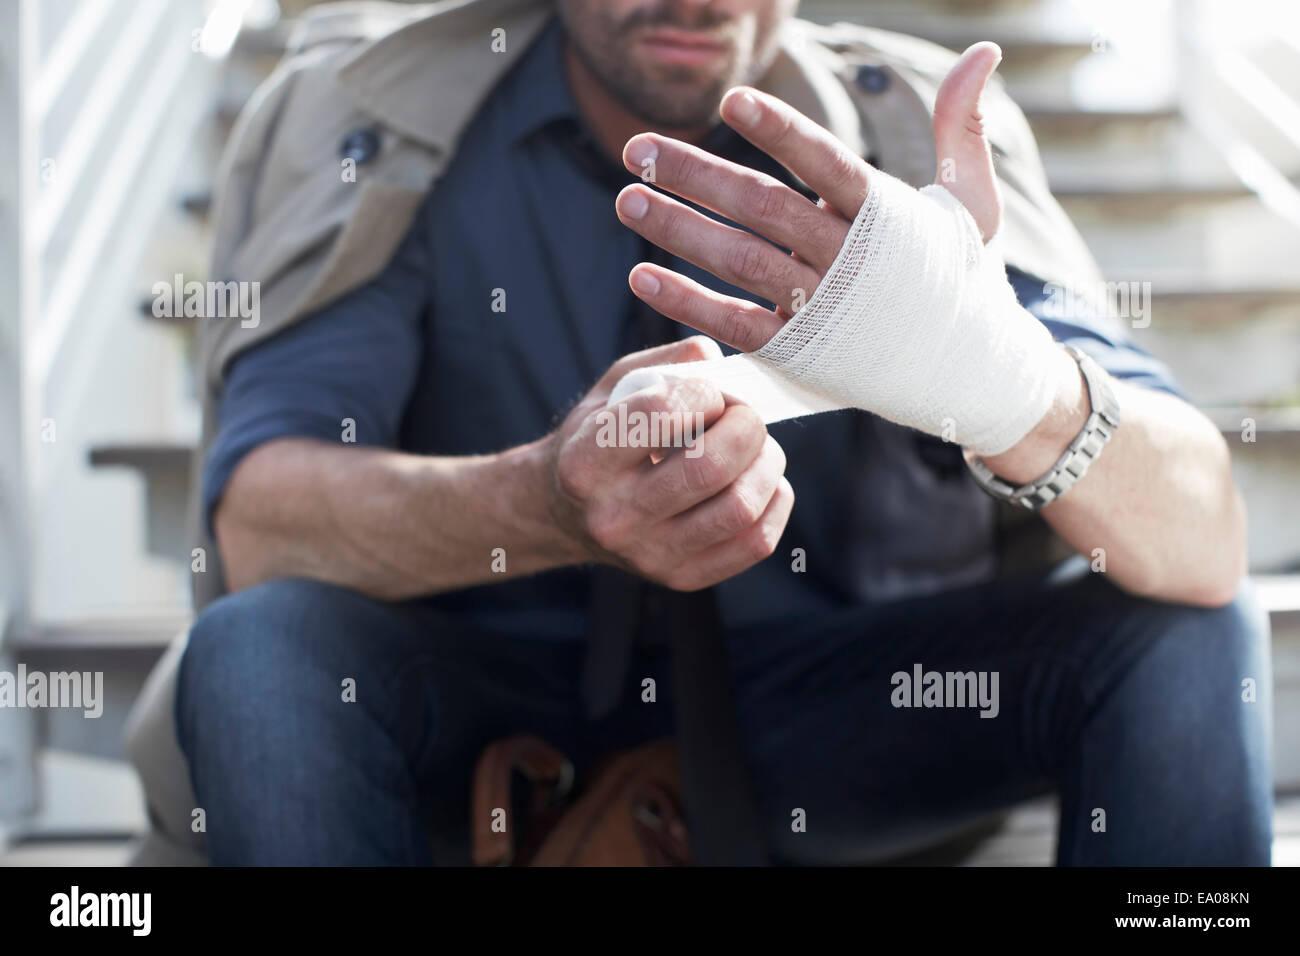 Man bandaging hand on staircase - Stock Image